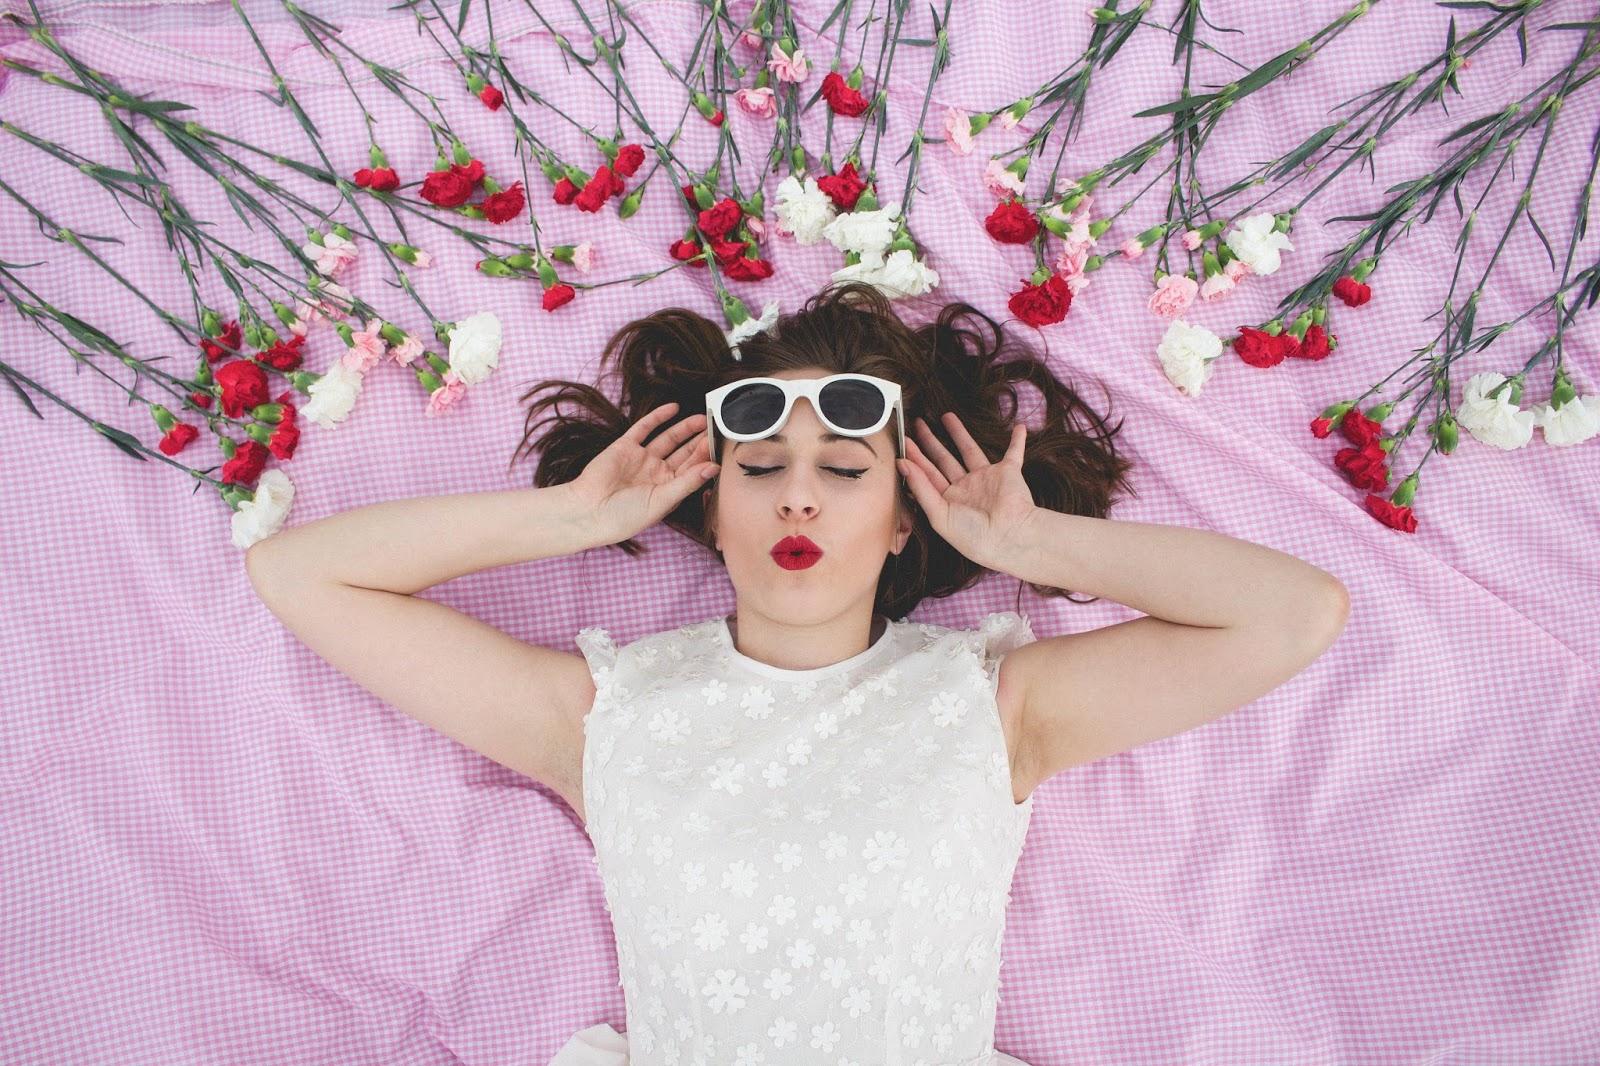 style, vintage, retro, vintage inspired, retro inspired, jones and jones, jones + jones, white short formal dress, white mini dress, floral white dress, audrey hepburn style, taylor swift style, ariana grande style, lolita, american beauty style, screenwriting, feminism, women in film, fashion blogger, film blogger, vintage style, tulle skirt dress, pleated skirt dress, 60's style, classic style, classic hollywood,